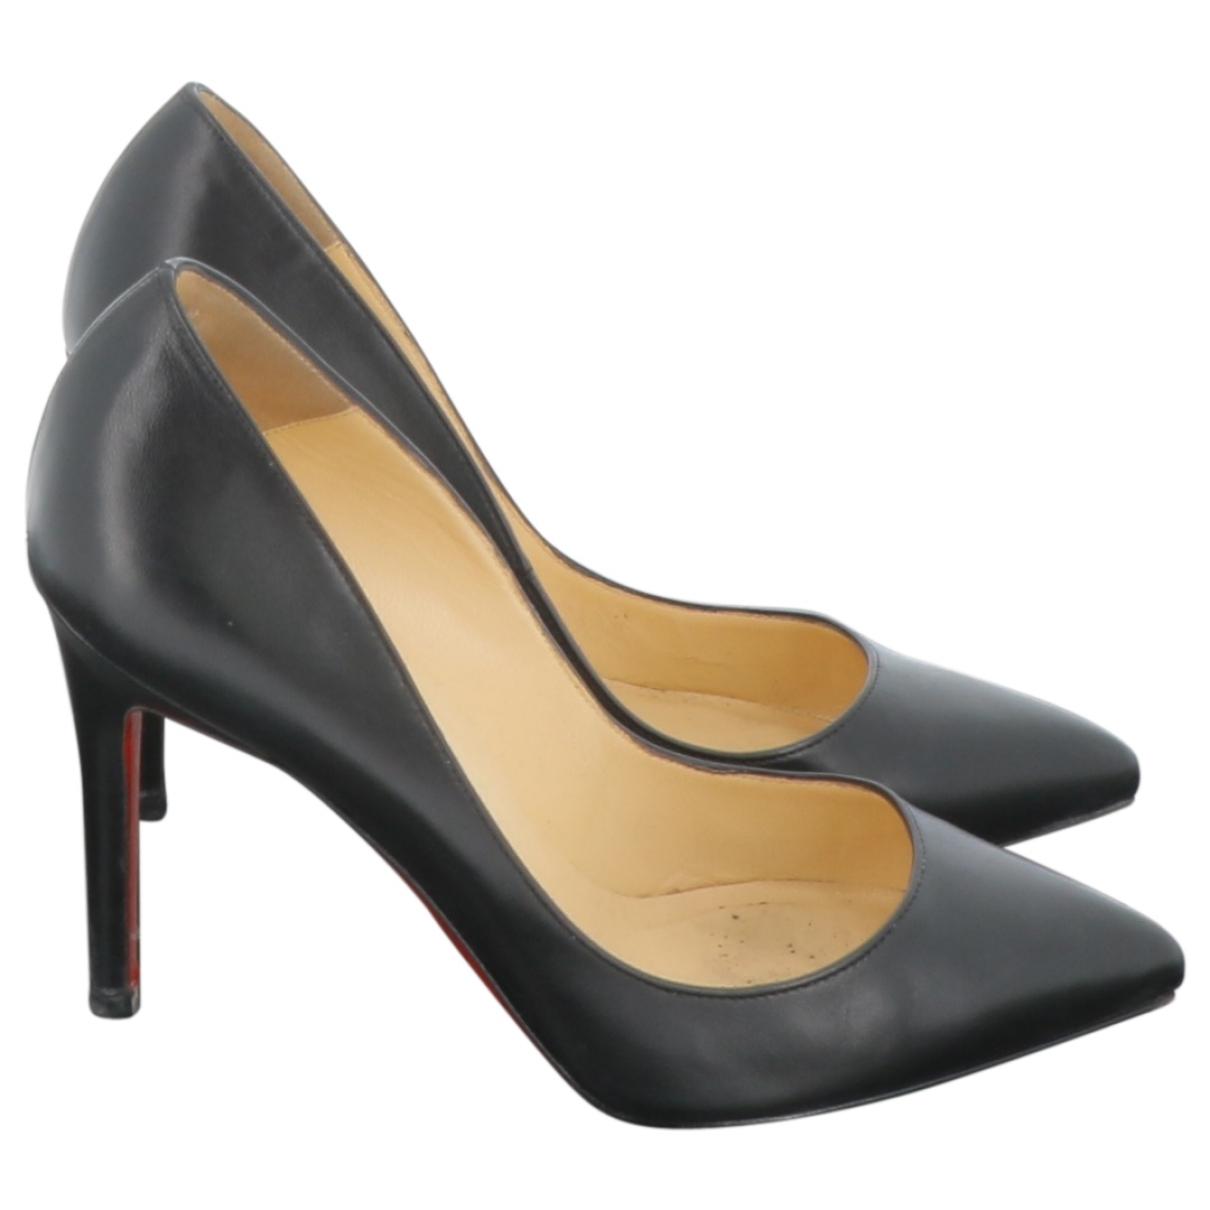 Christian Louboutin \N Black Leather Heels for Women 36 EU